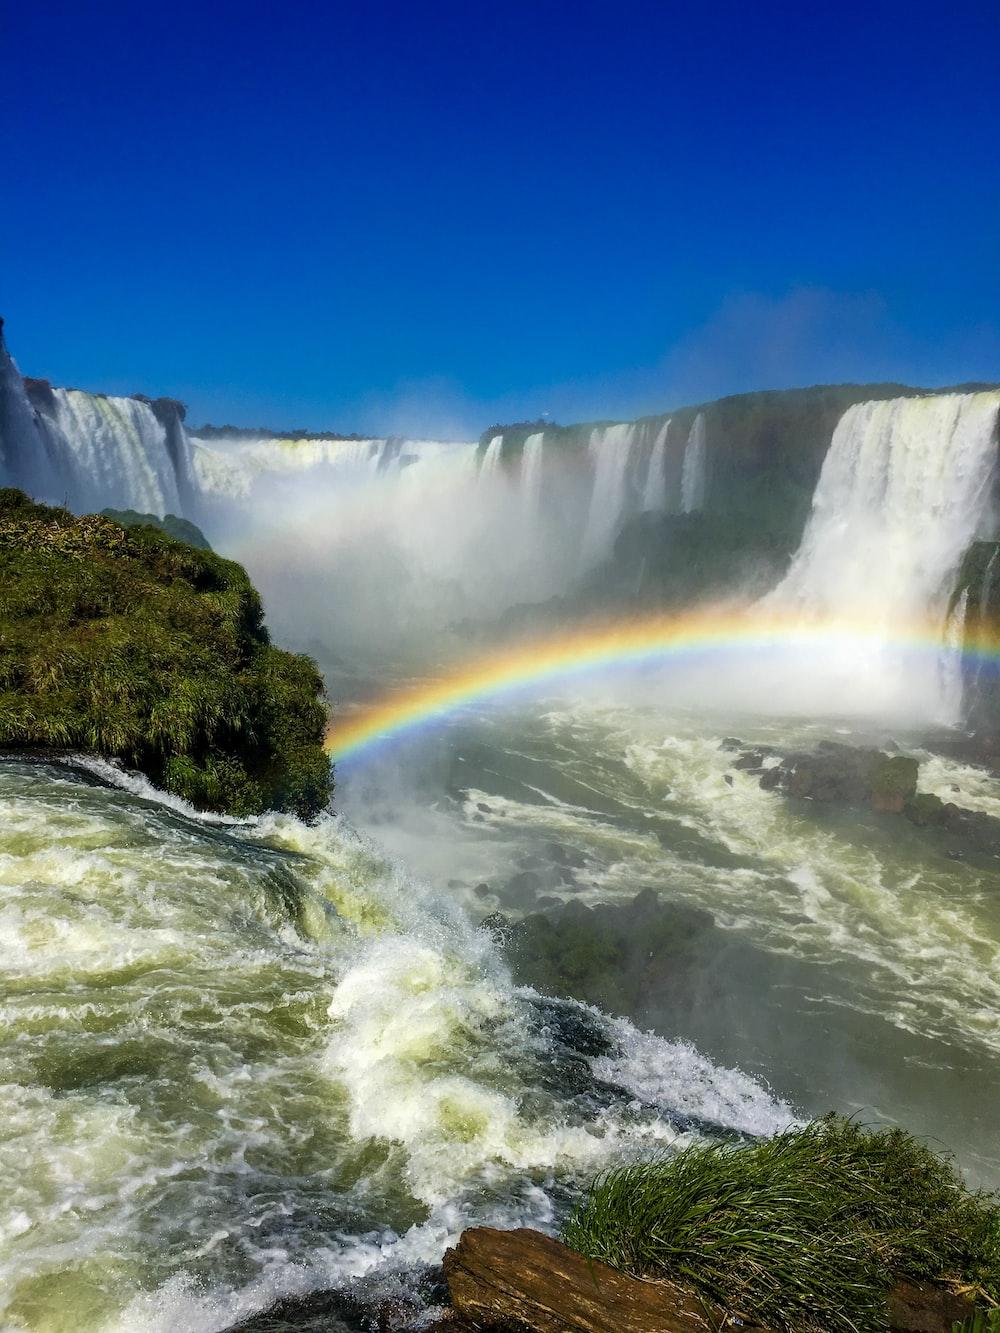 Niagara falls showing rainbow